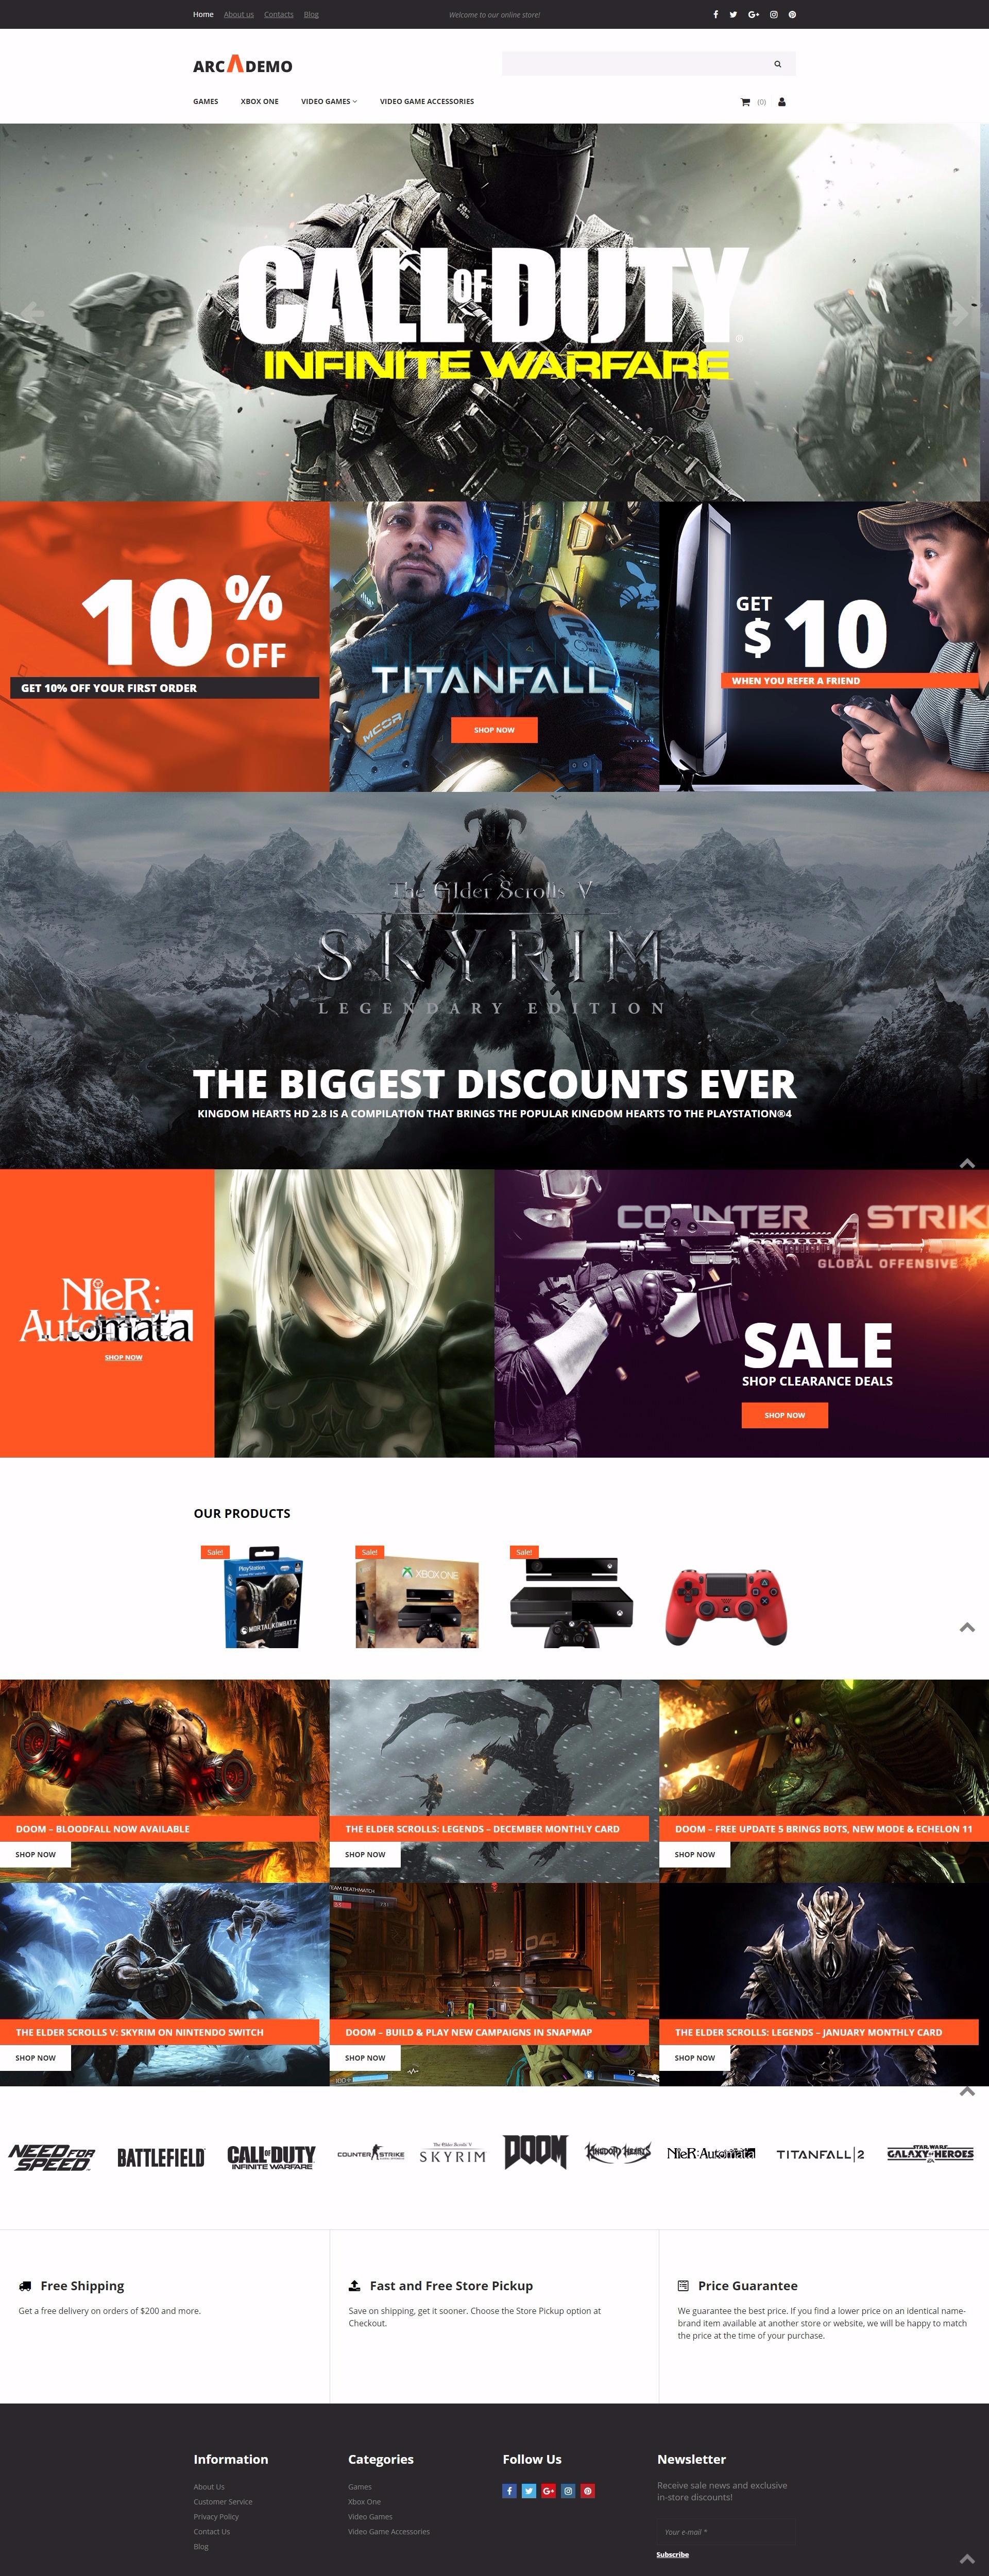 Arcademo - Video Games Shop MotoCMS Ecommerce Template